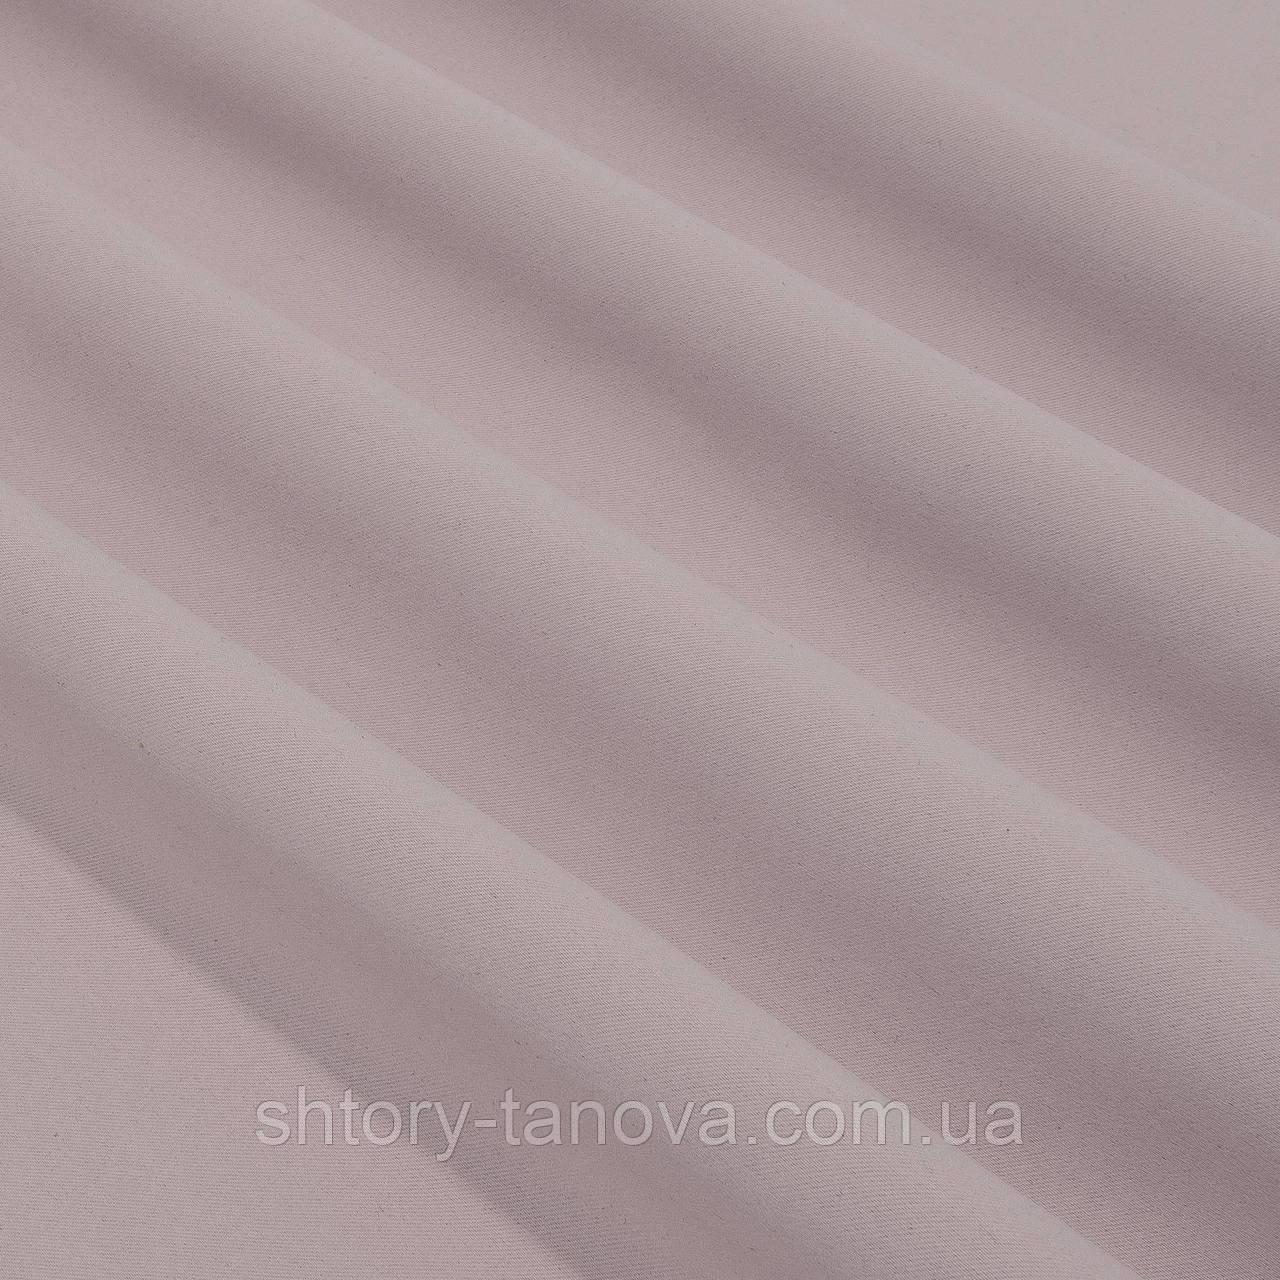 Декор блекаут розовый жемчуг